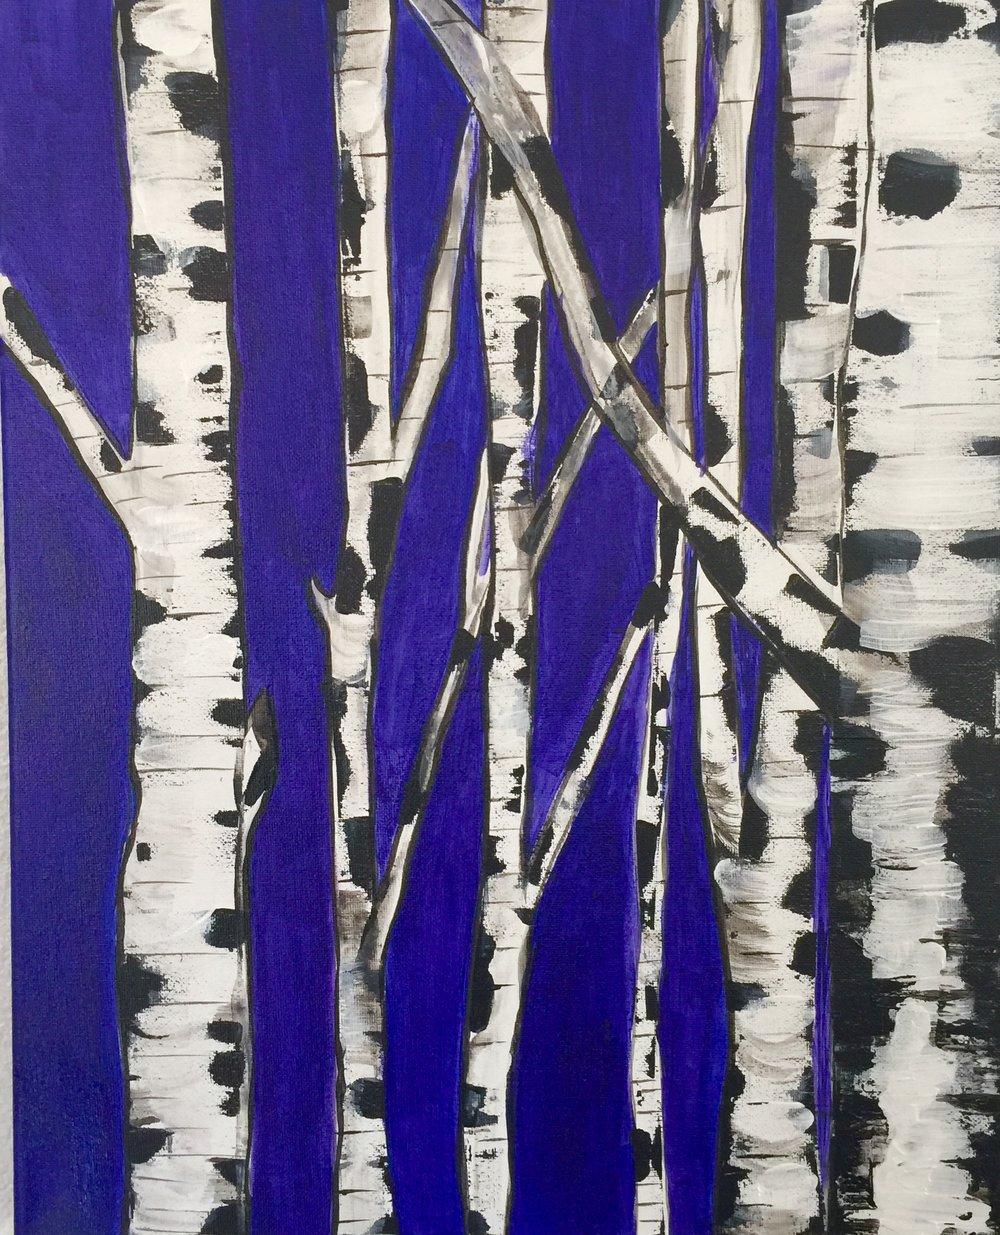 Birch Trees - 16 x 20